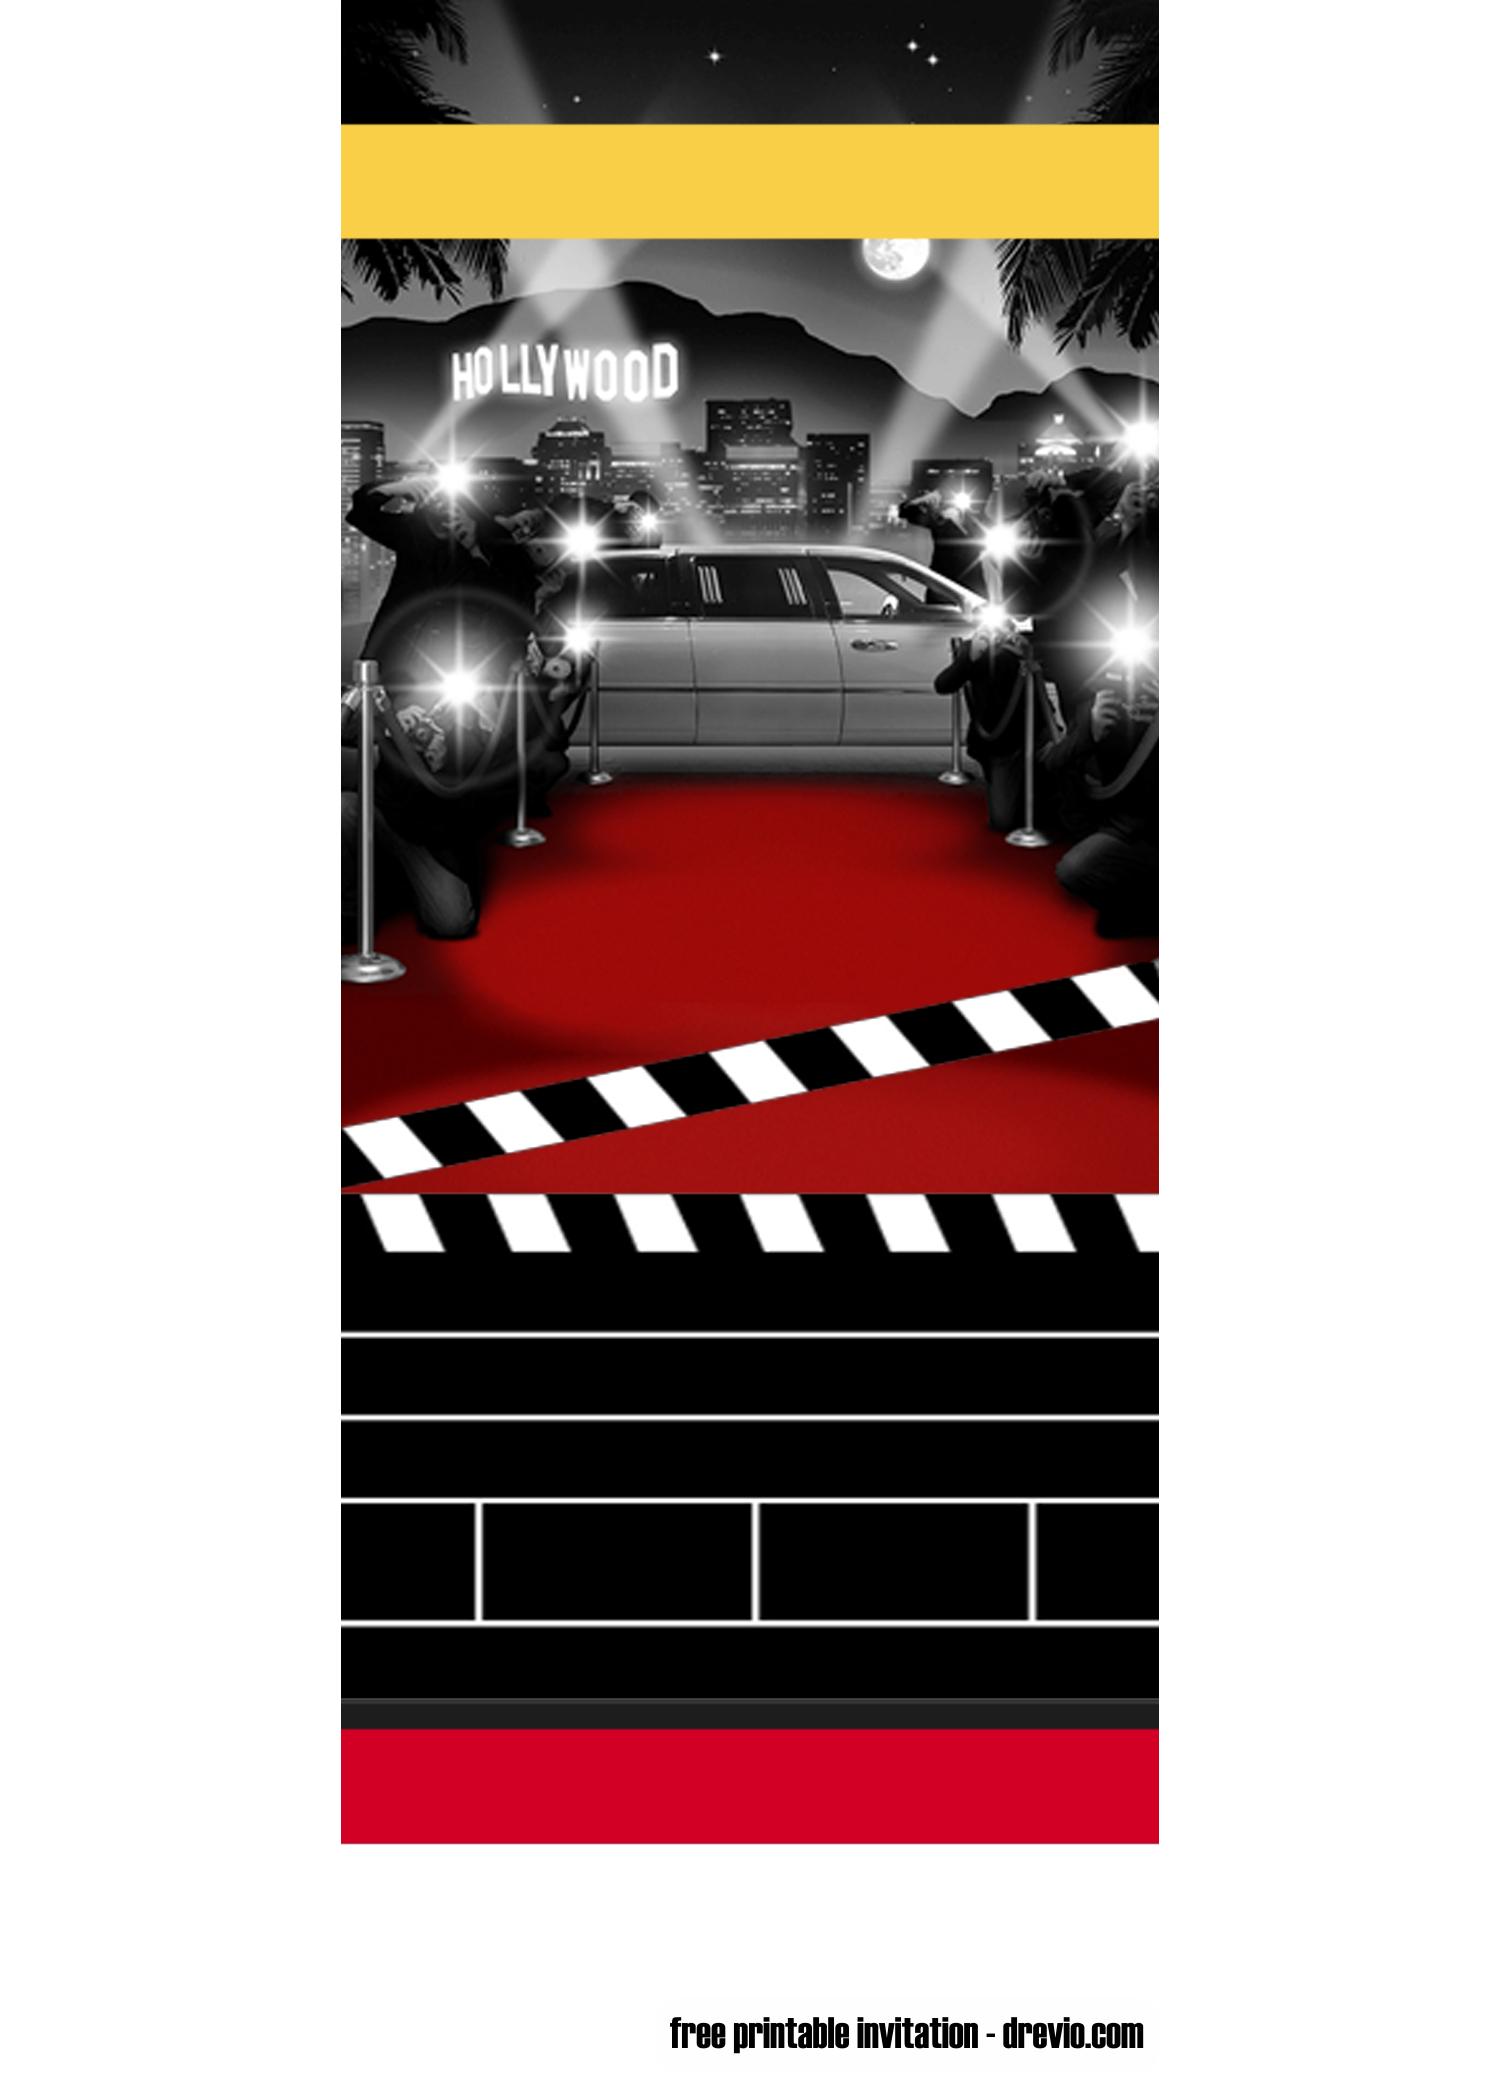 Free Printable Movie Ticket Party Invitation Template Hollywood Invitations Party Invite Template Ticket Party Invitations